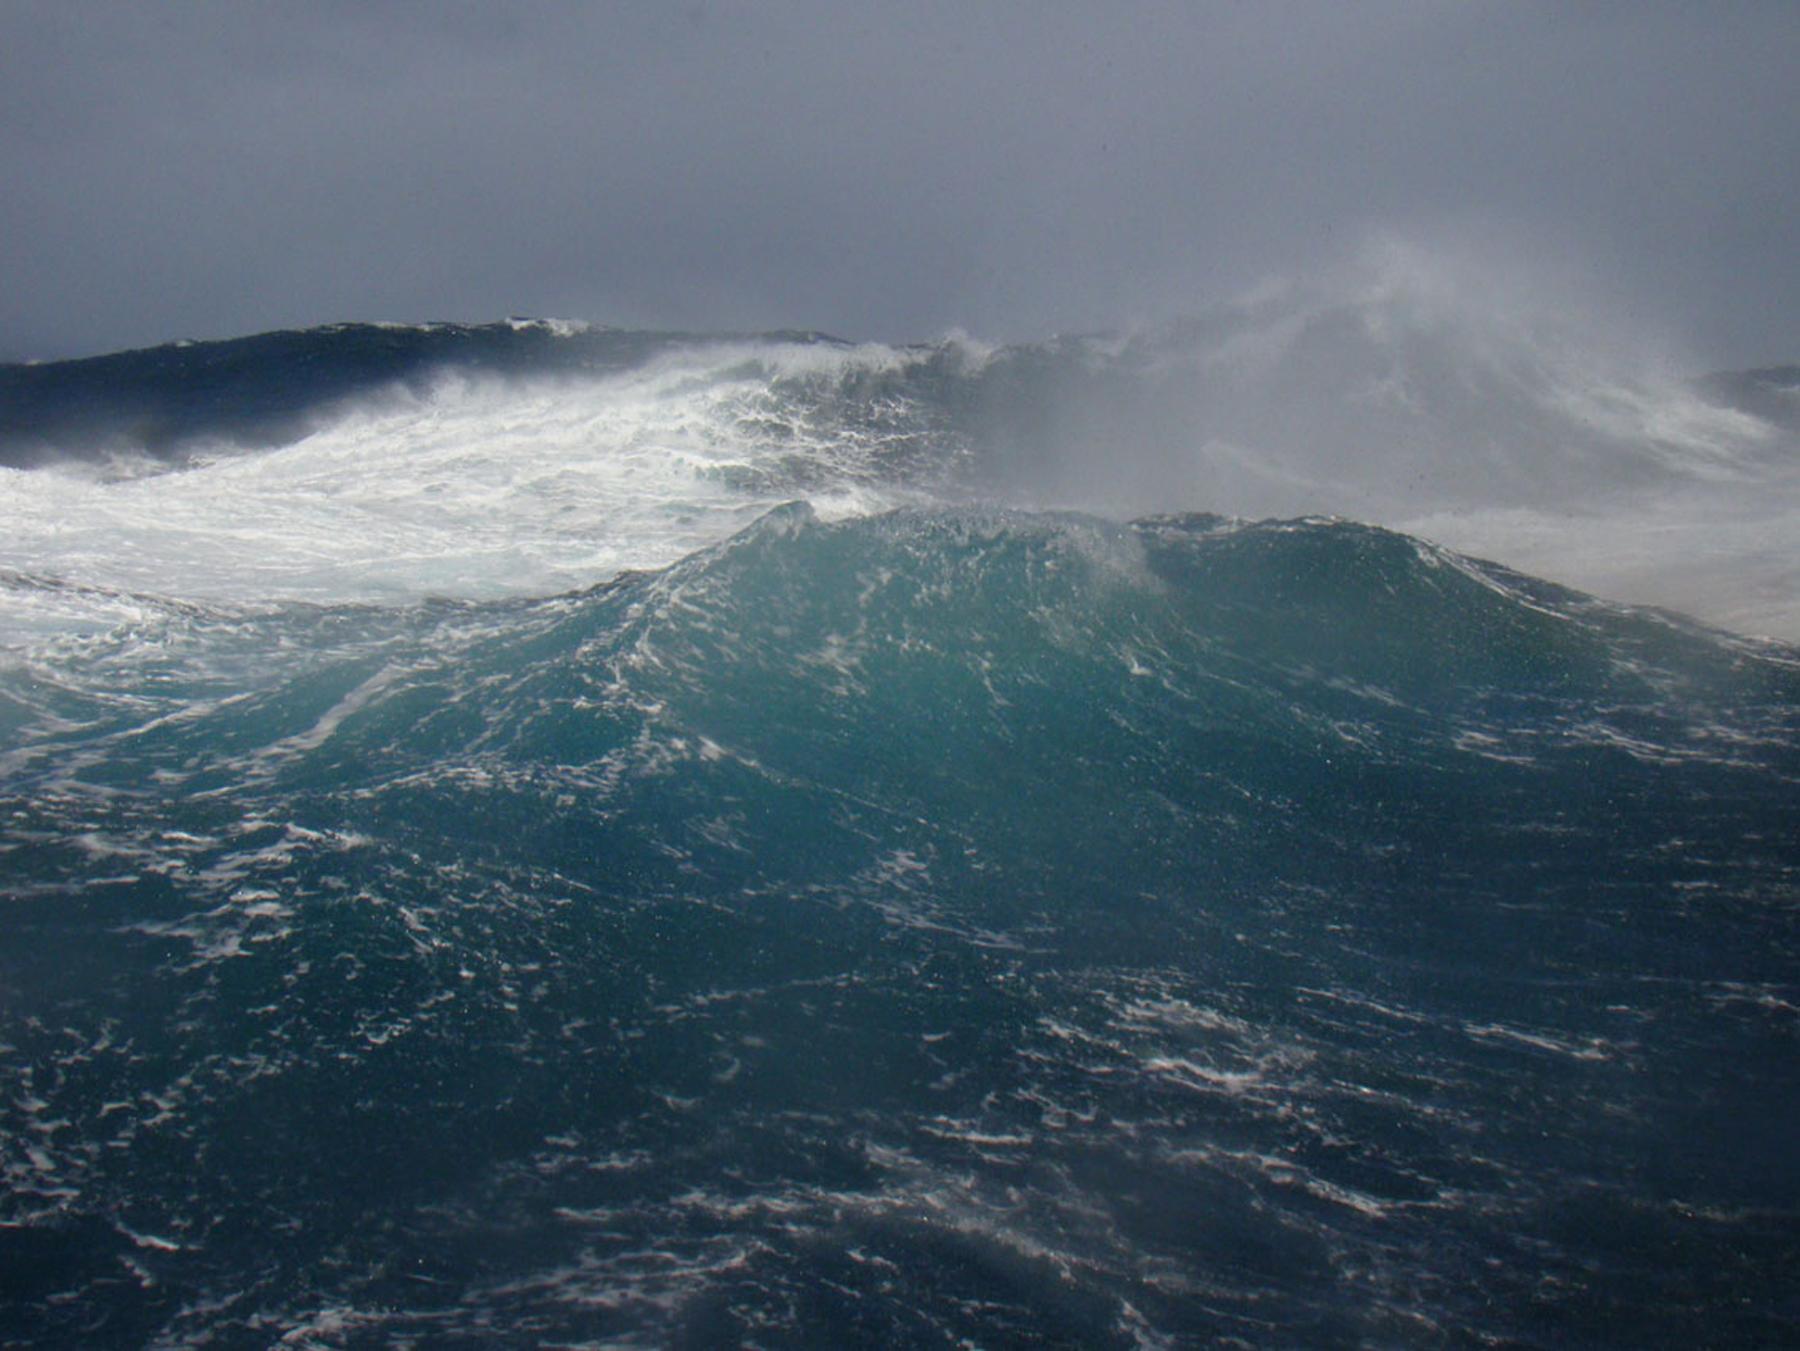 A big wave. Photo: Margrith Ettlin, Alfred Wegener Institute